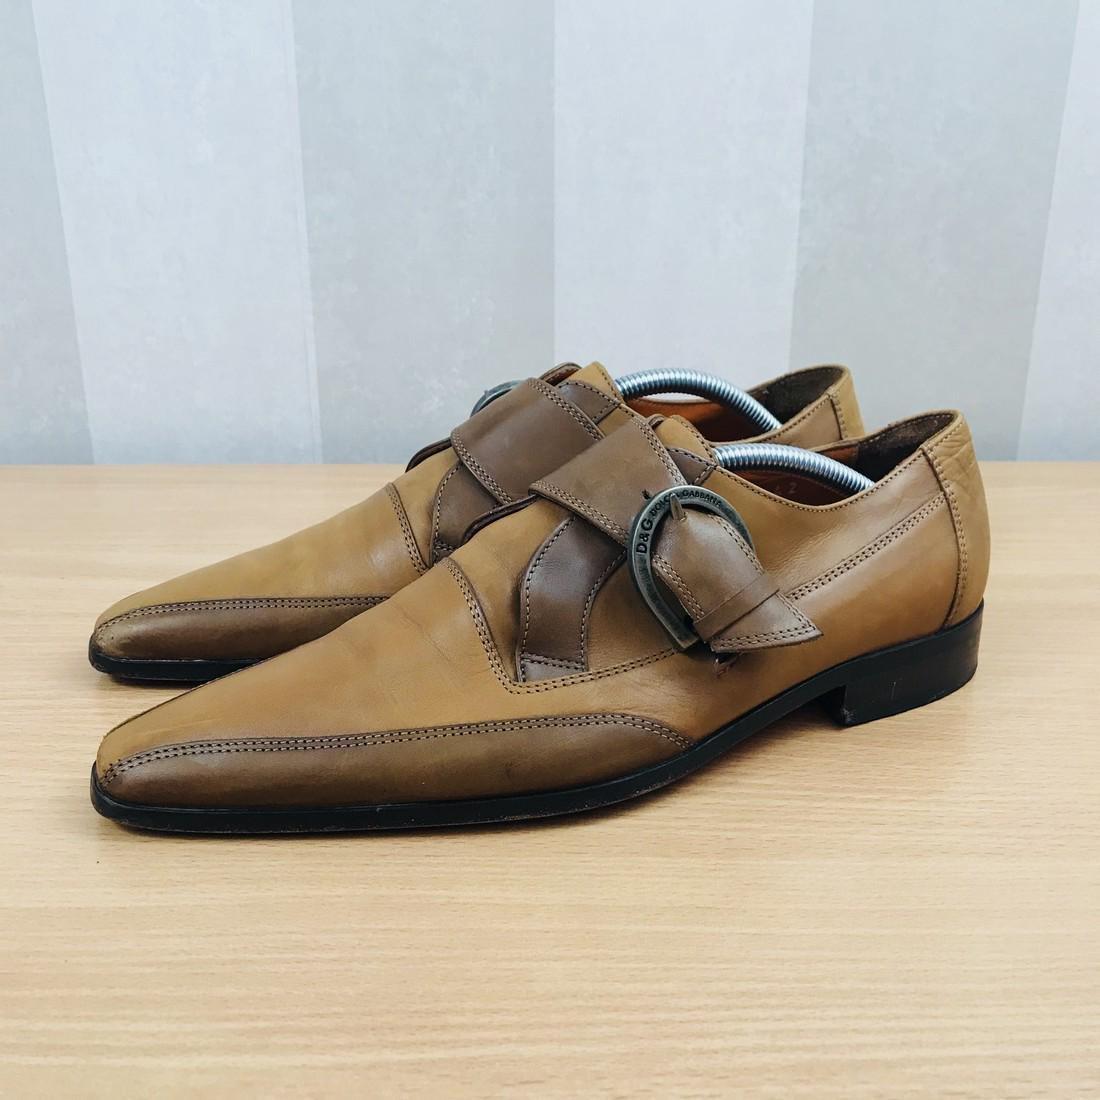 Dolce & Gabbana – Leather Shoes Size EUR 42 UK 8.5 US 9